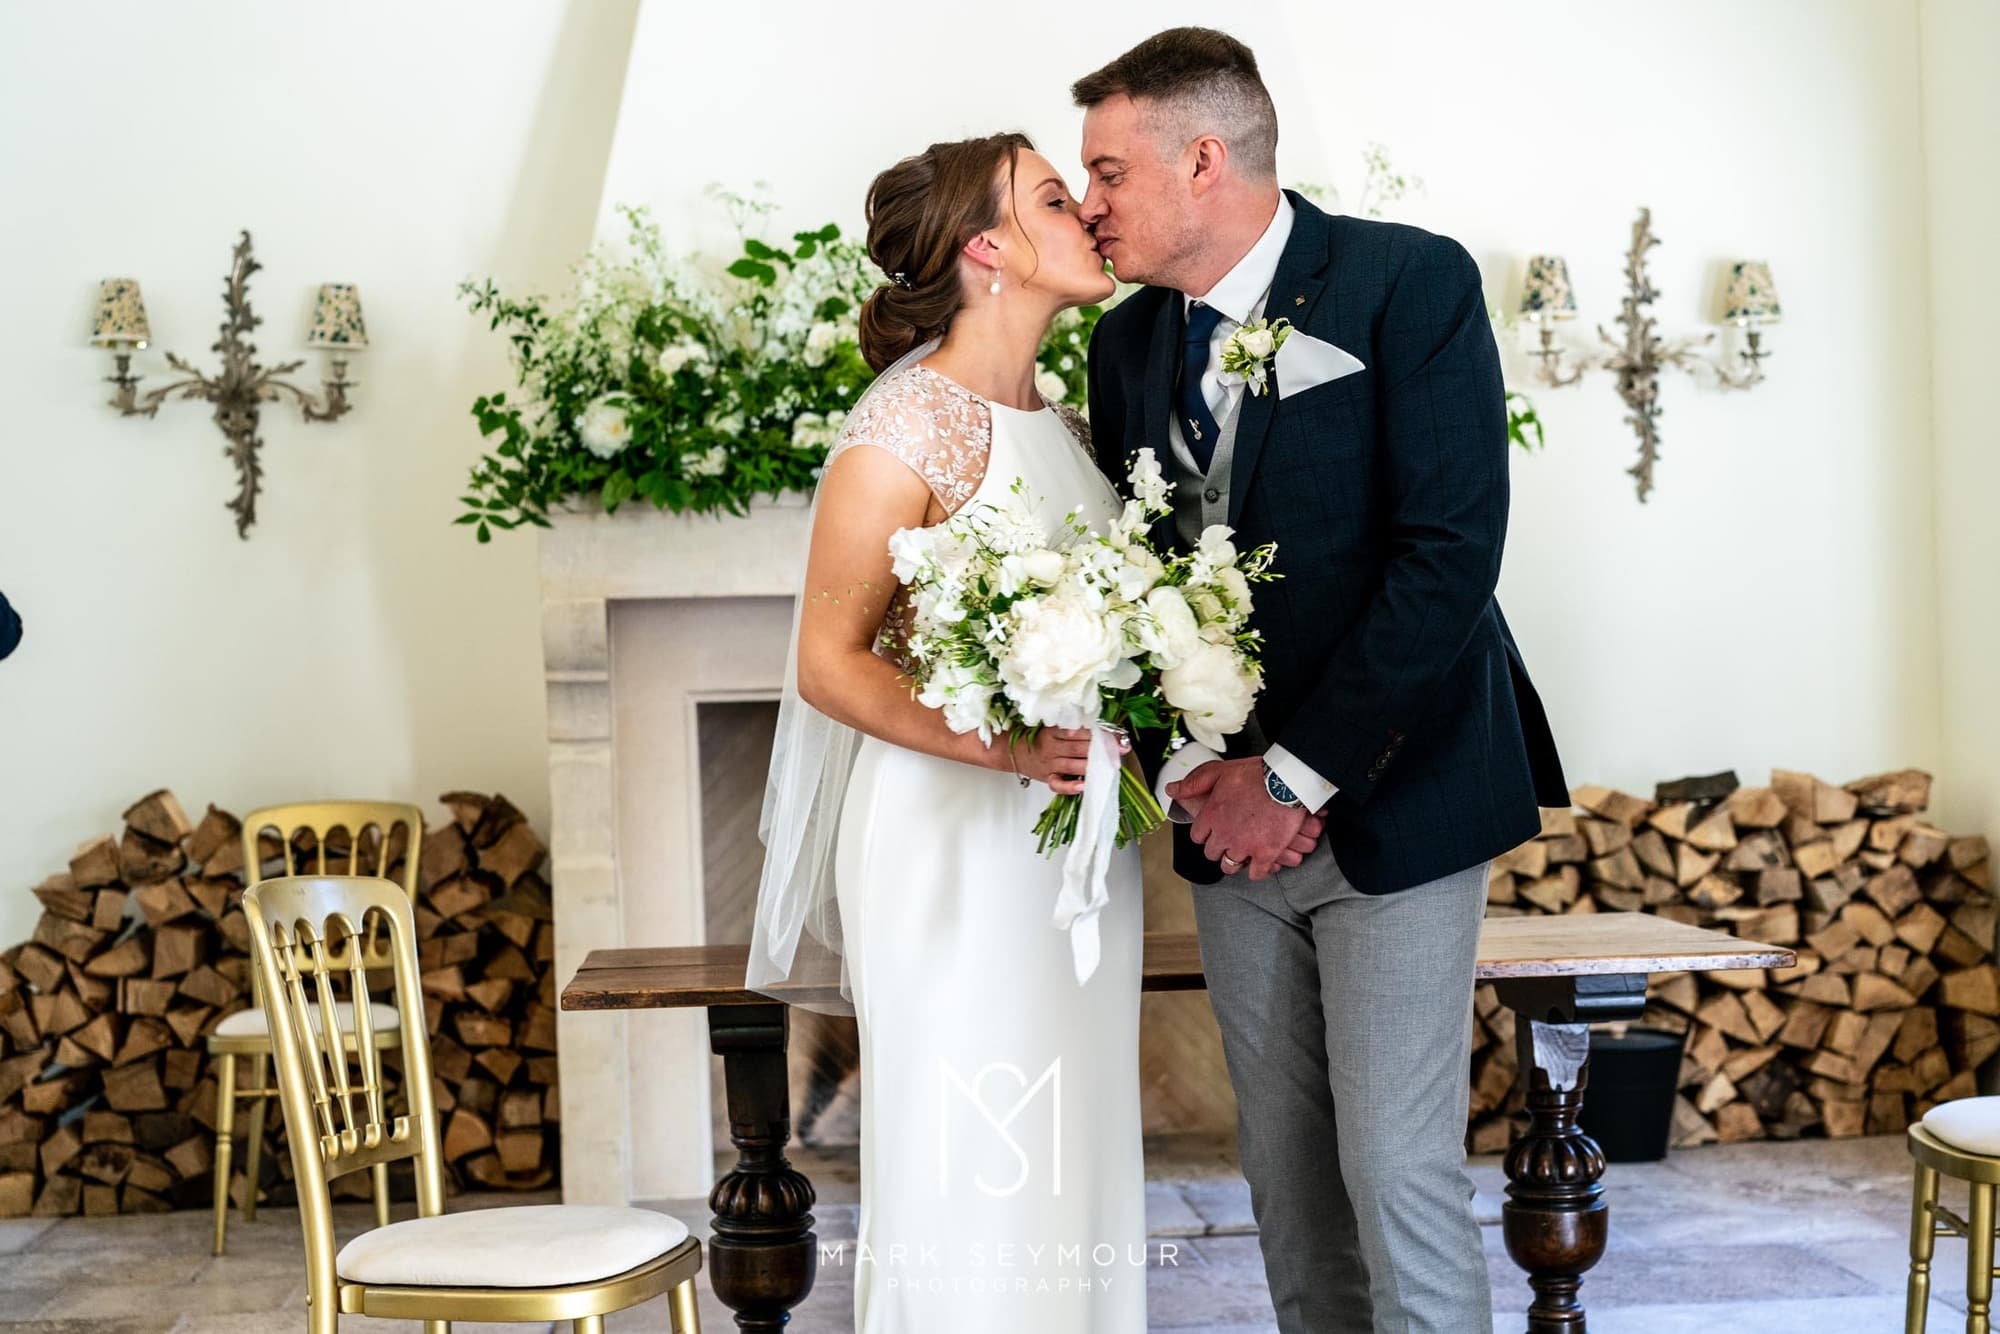 Hampden House Wedding Photography - Hannah and Lee's wedding. 5